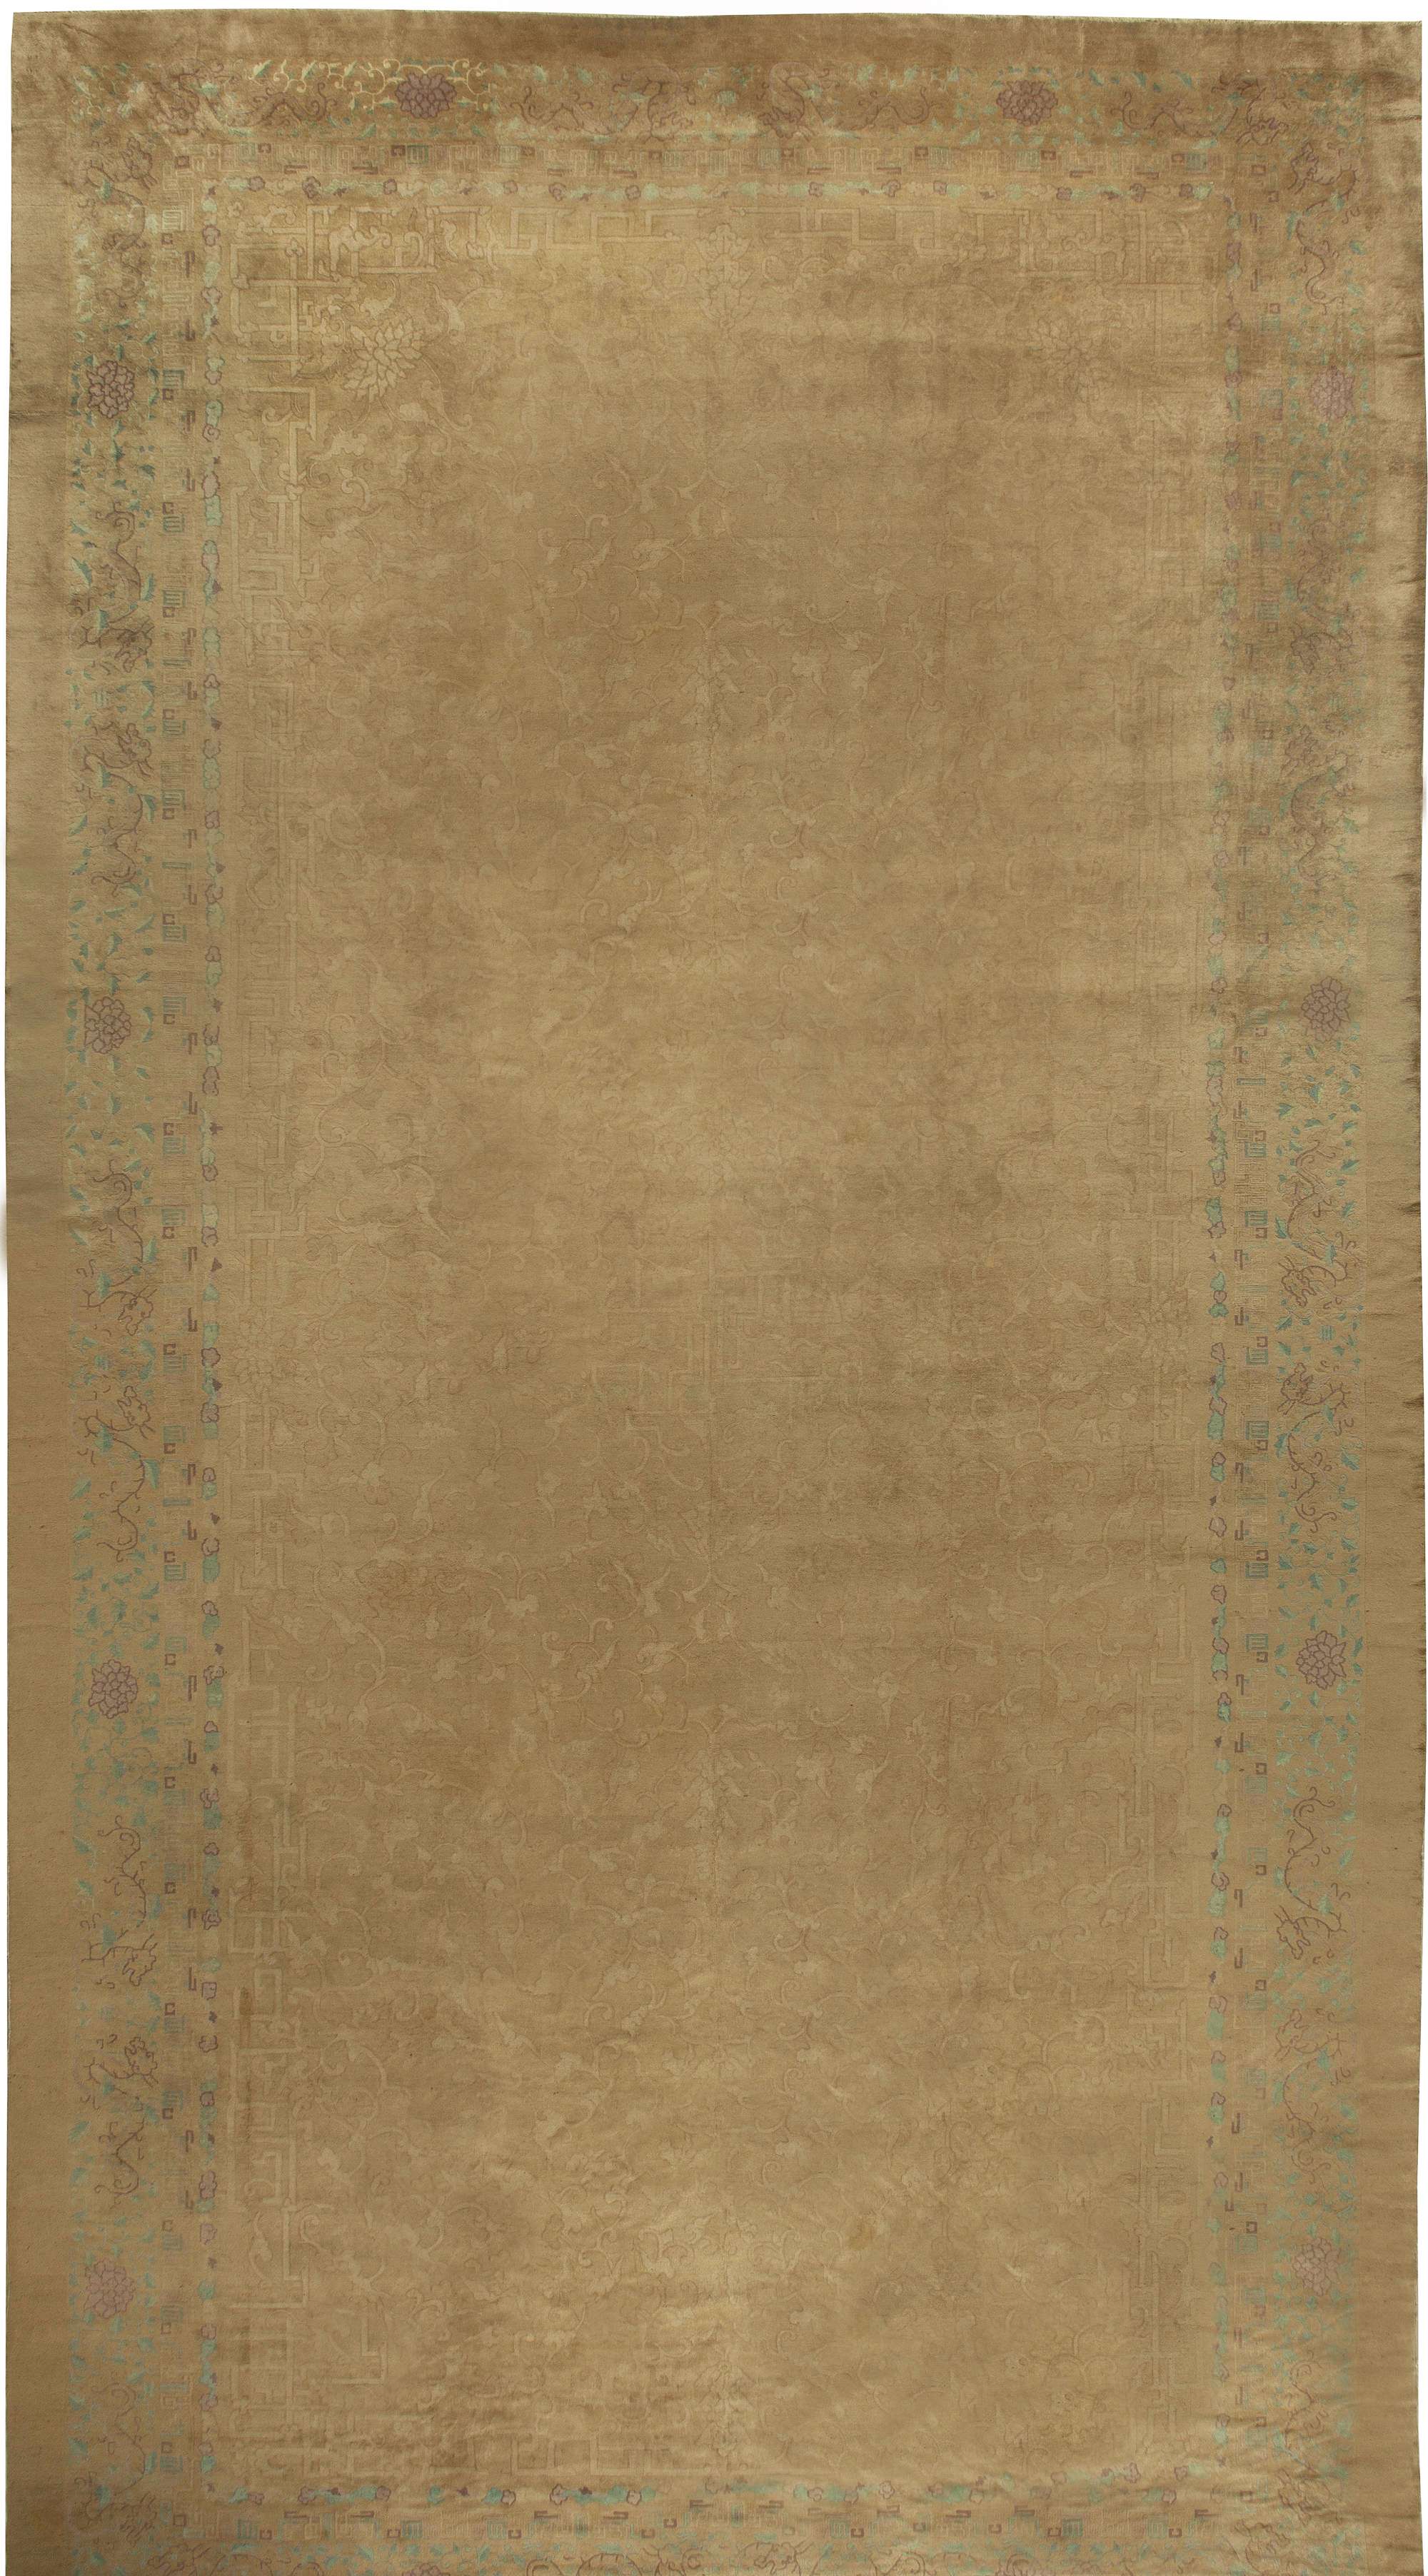 Vintage Chinese Rug (size adjusted) BB6130